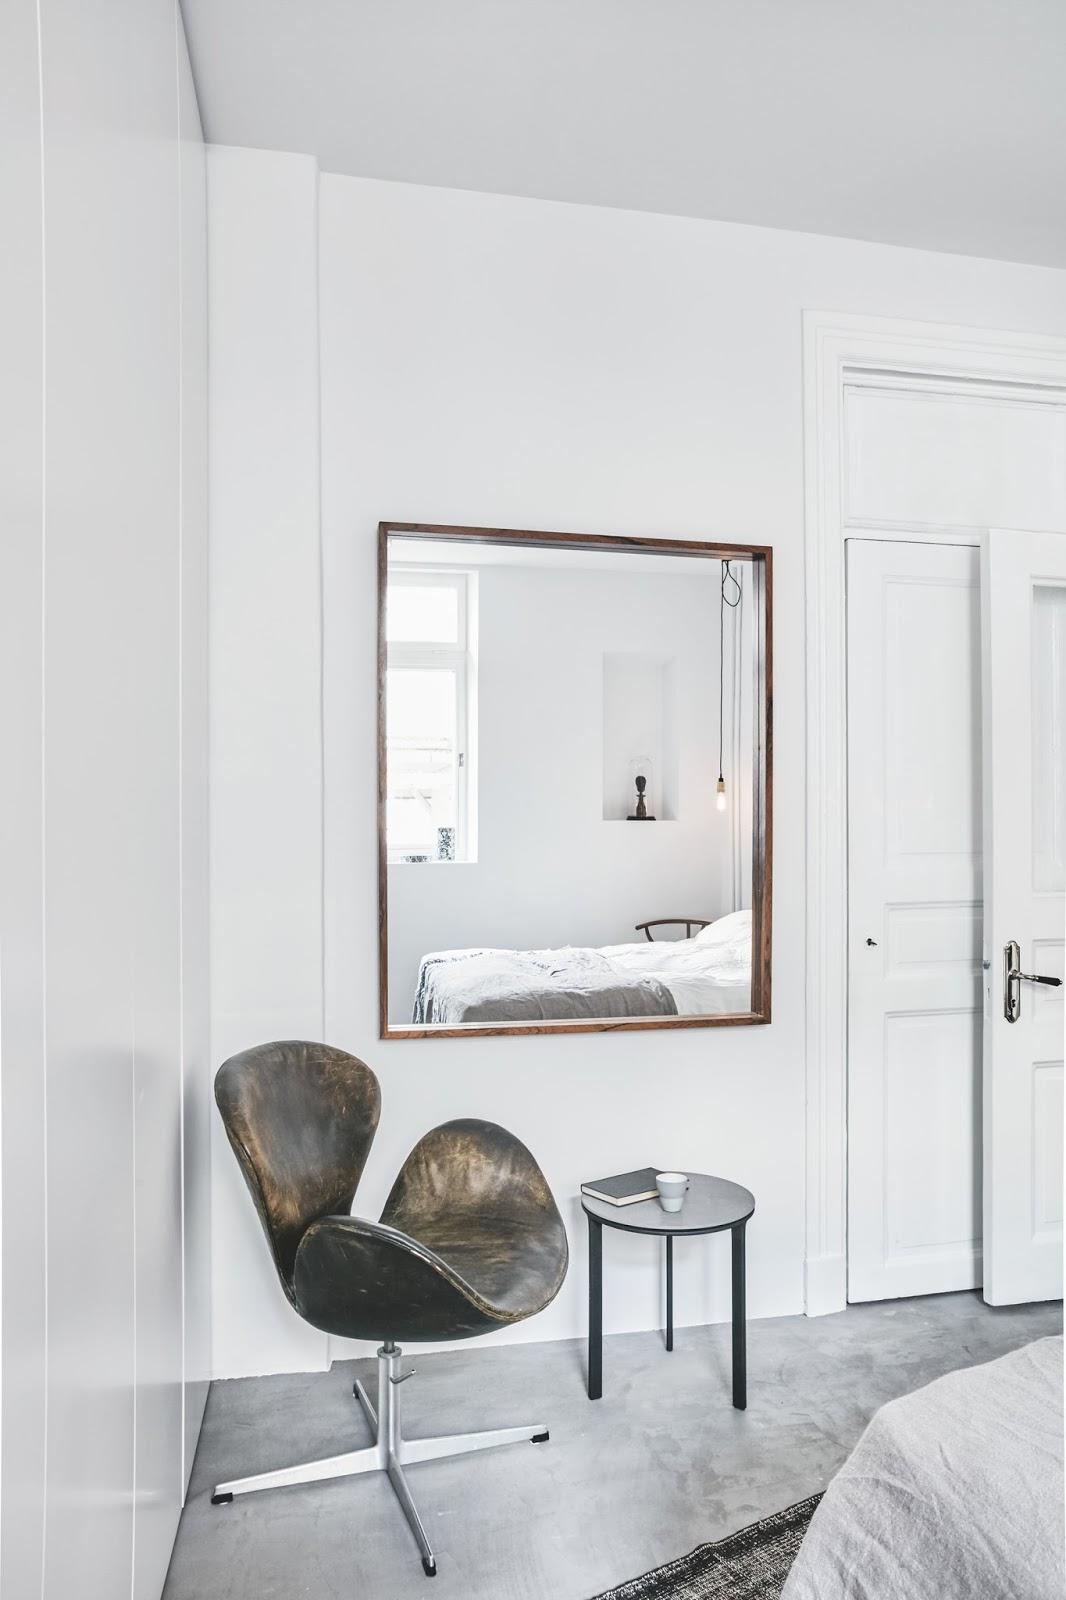 swan chair inside of an minimalist nordic bedroom